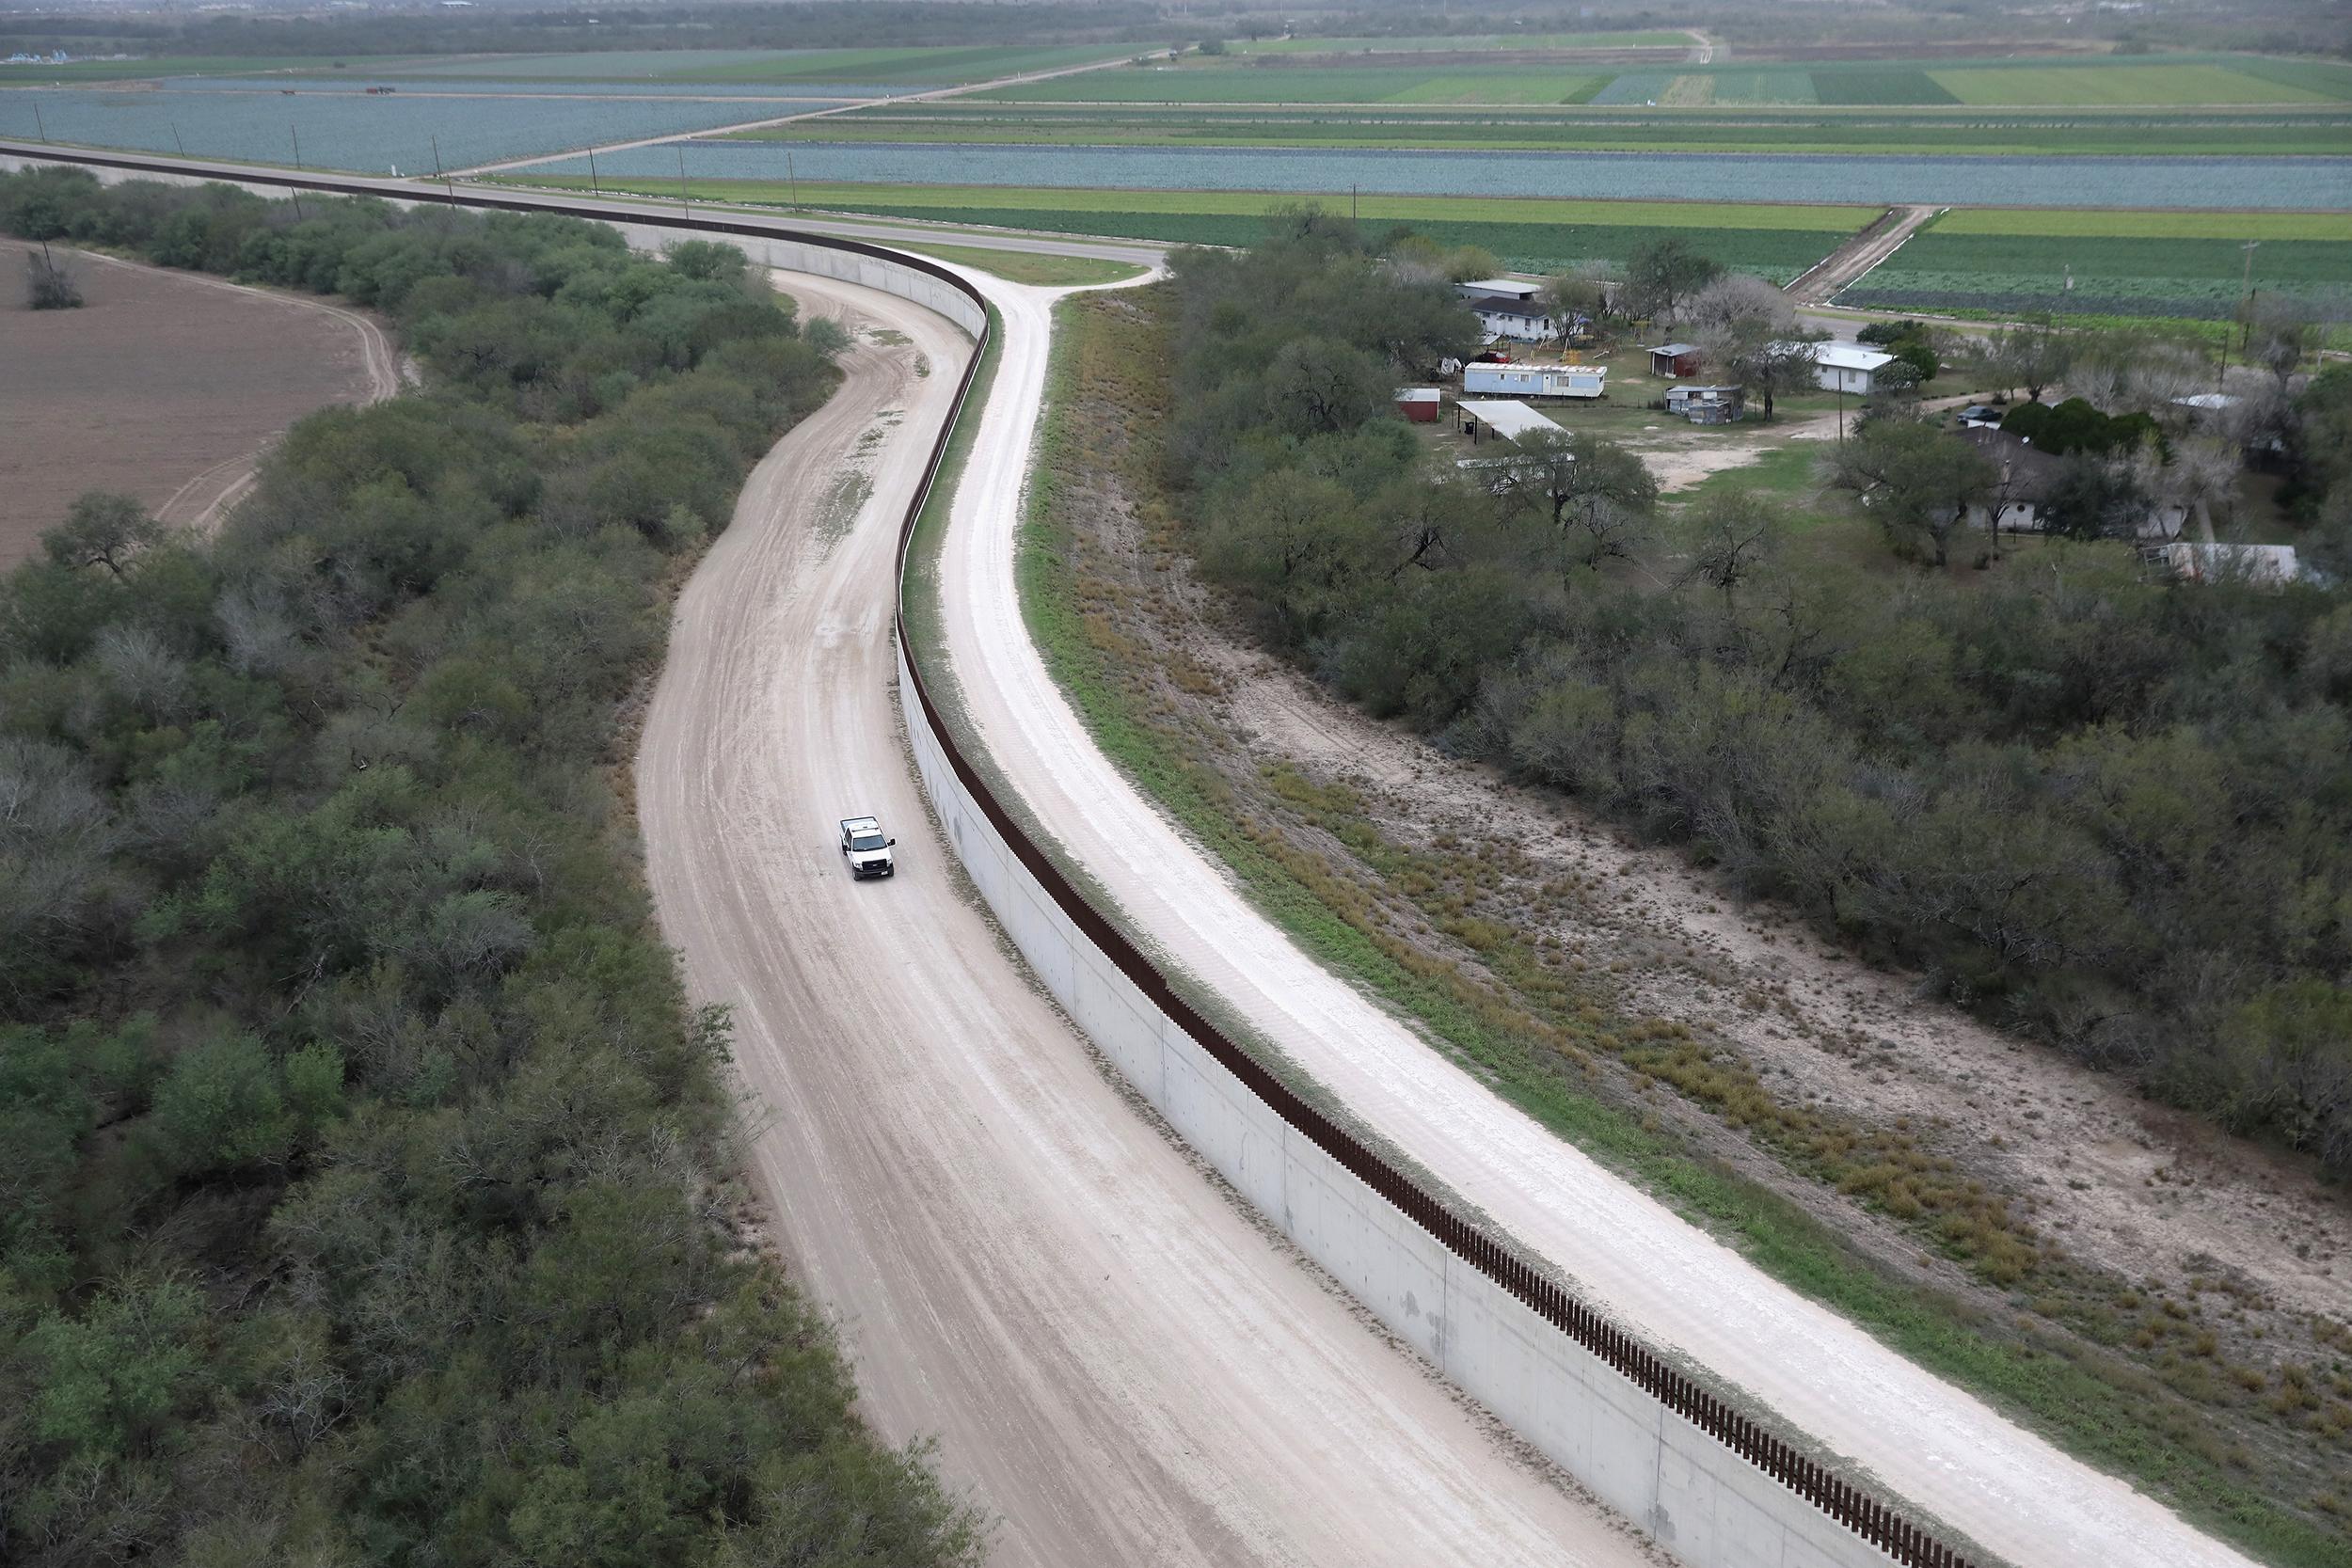 Image: A U.S. Border Patrol vehicle patrols next to a fence at the U.S.-Mexico border